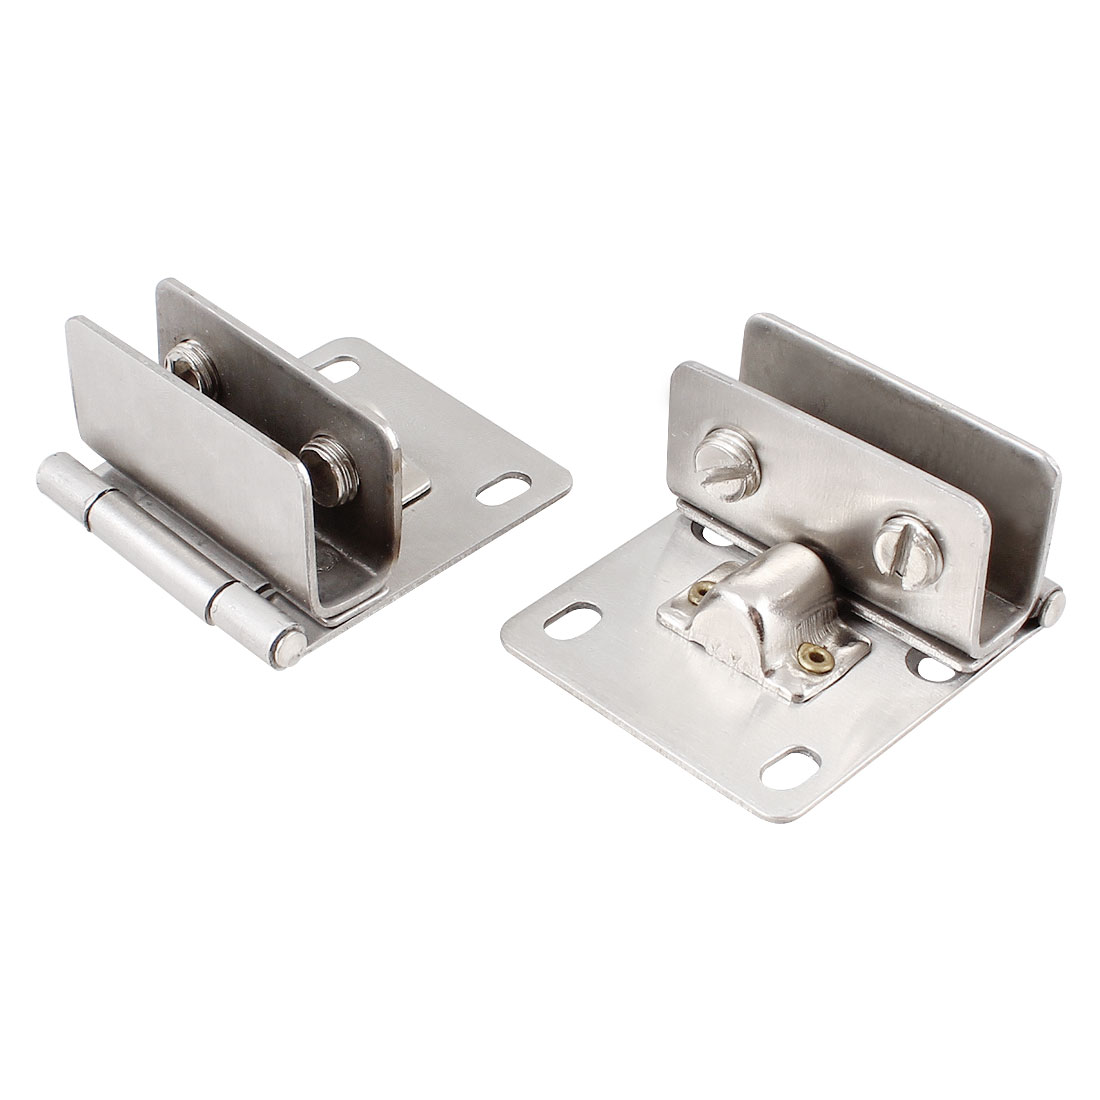 2 Pcs Bathroom 10mm Thickness Glass Door Hinge Silver Tone Set